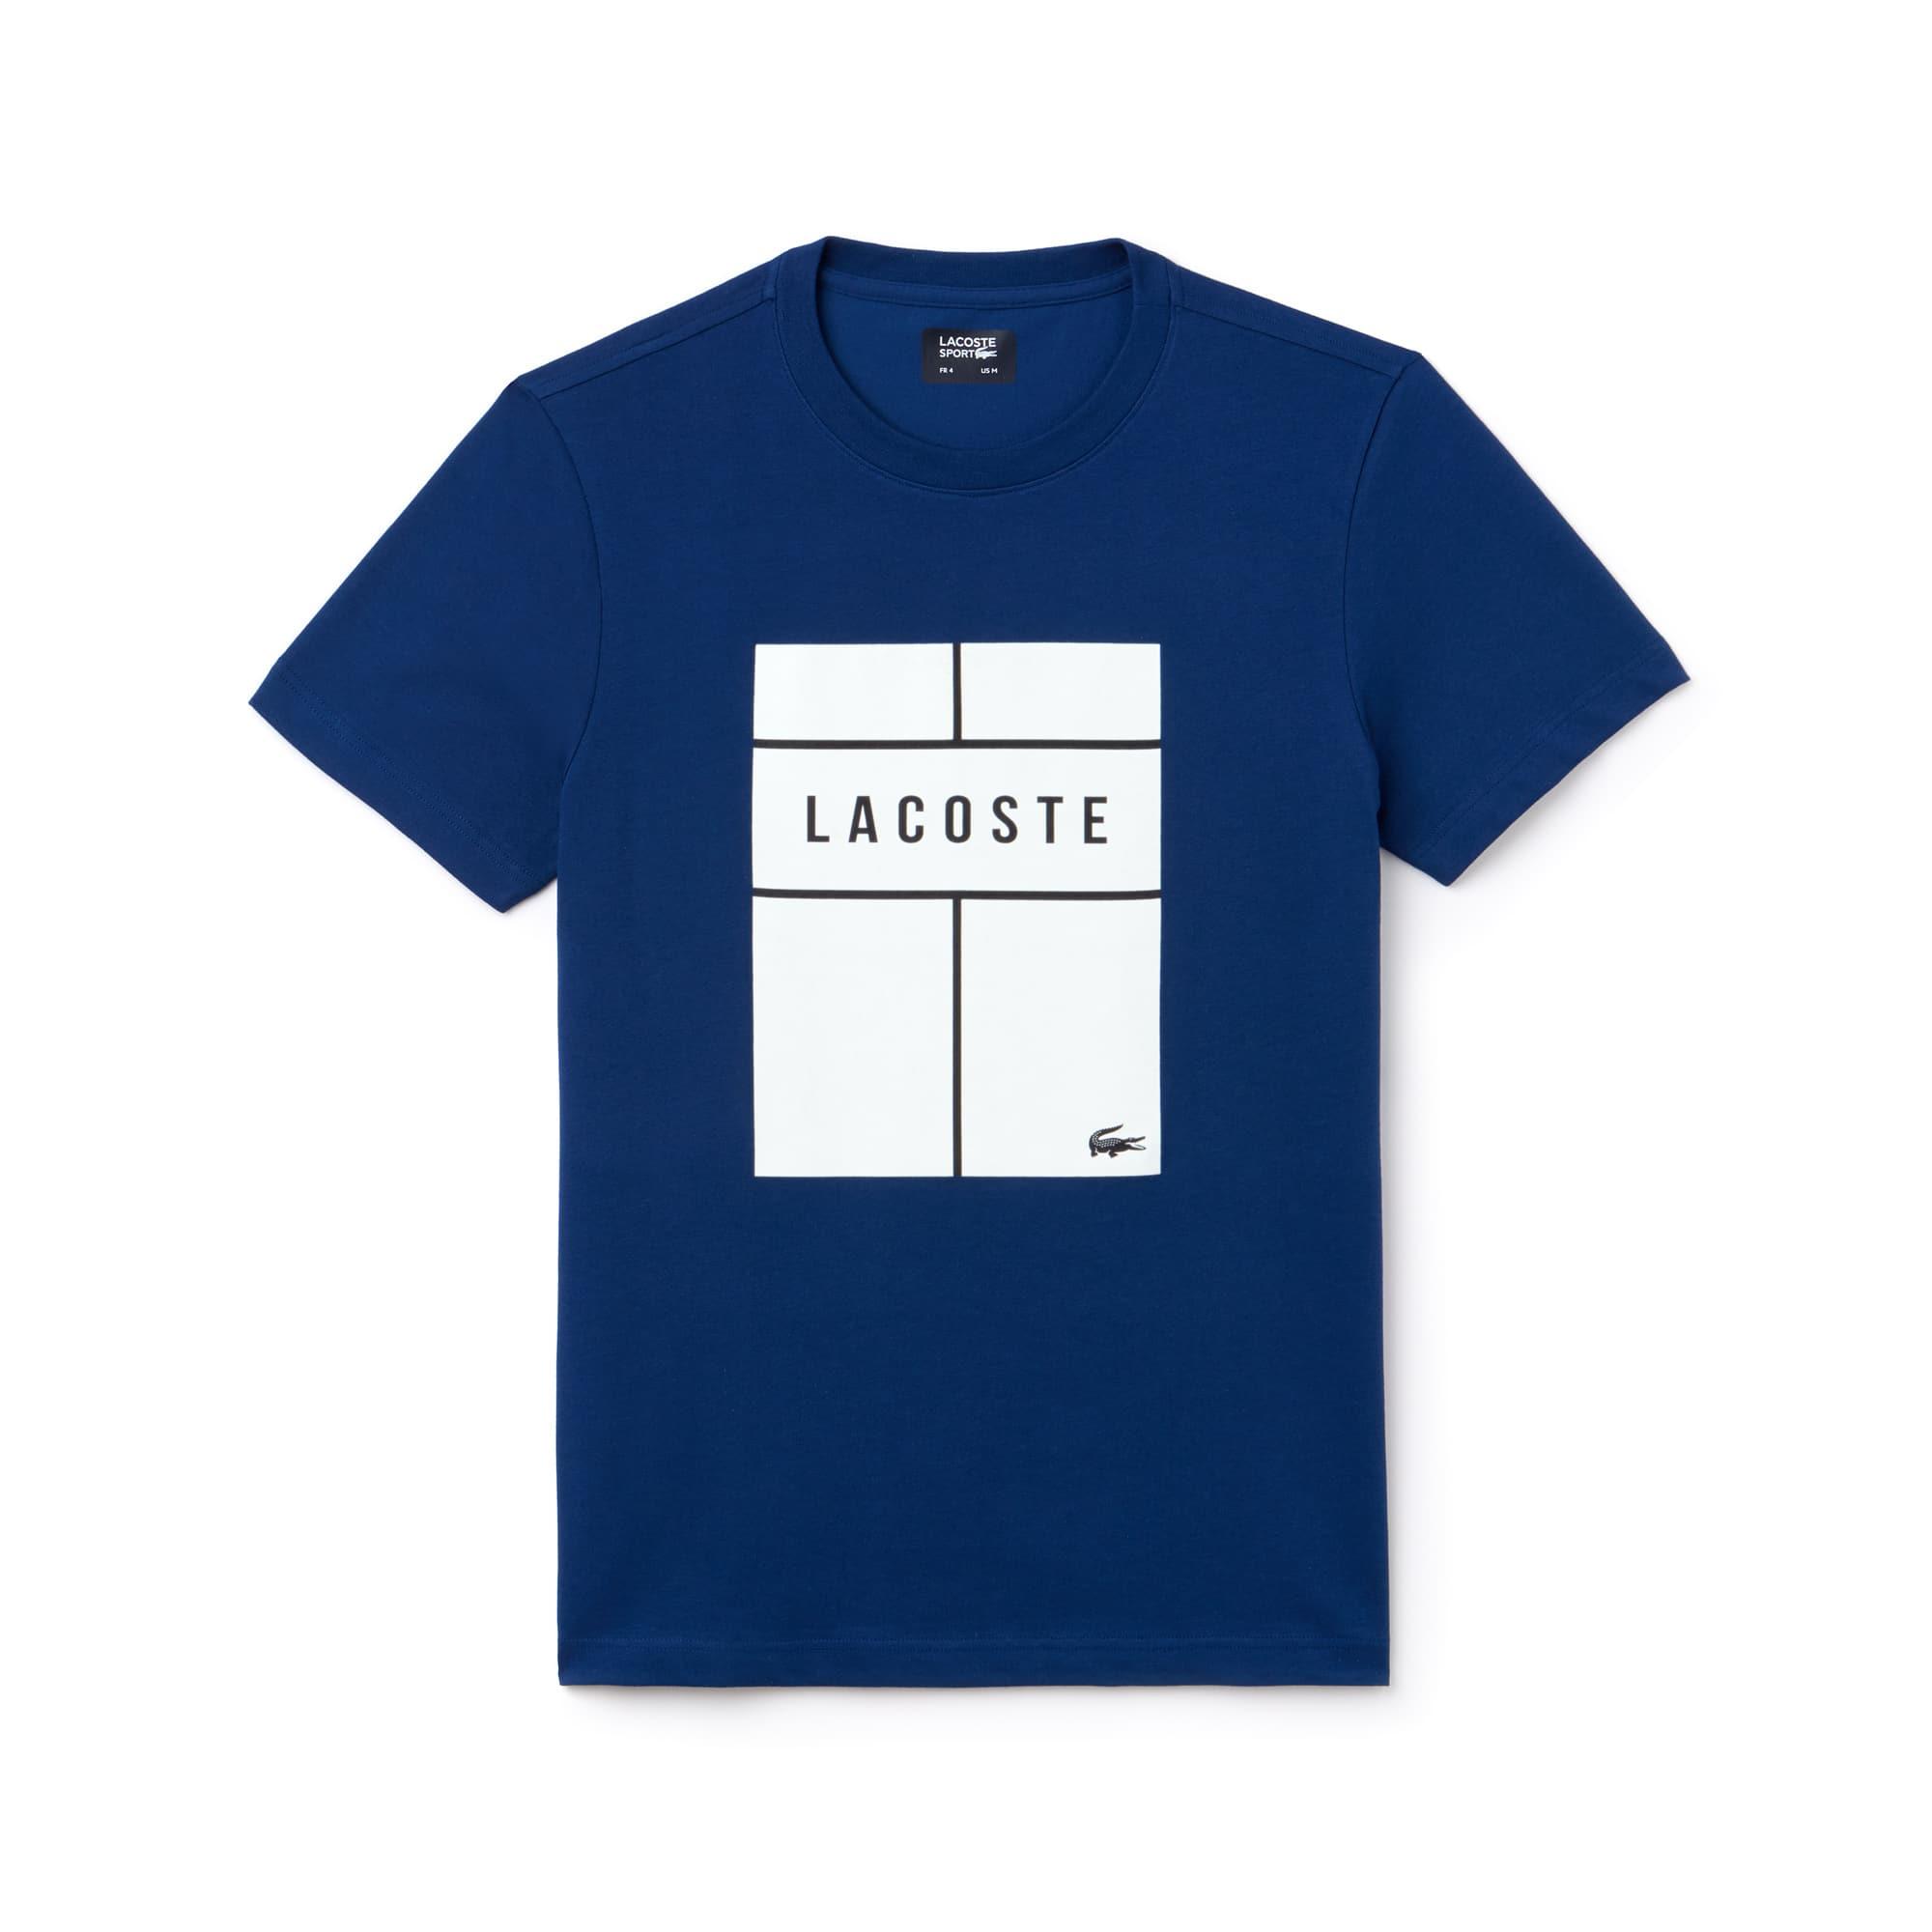 Men's Lacoste SPORT Crew Neck Lettering Jersey Tennis T-shirt